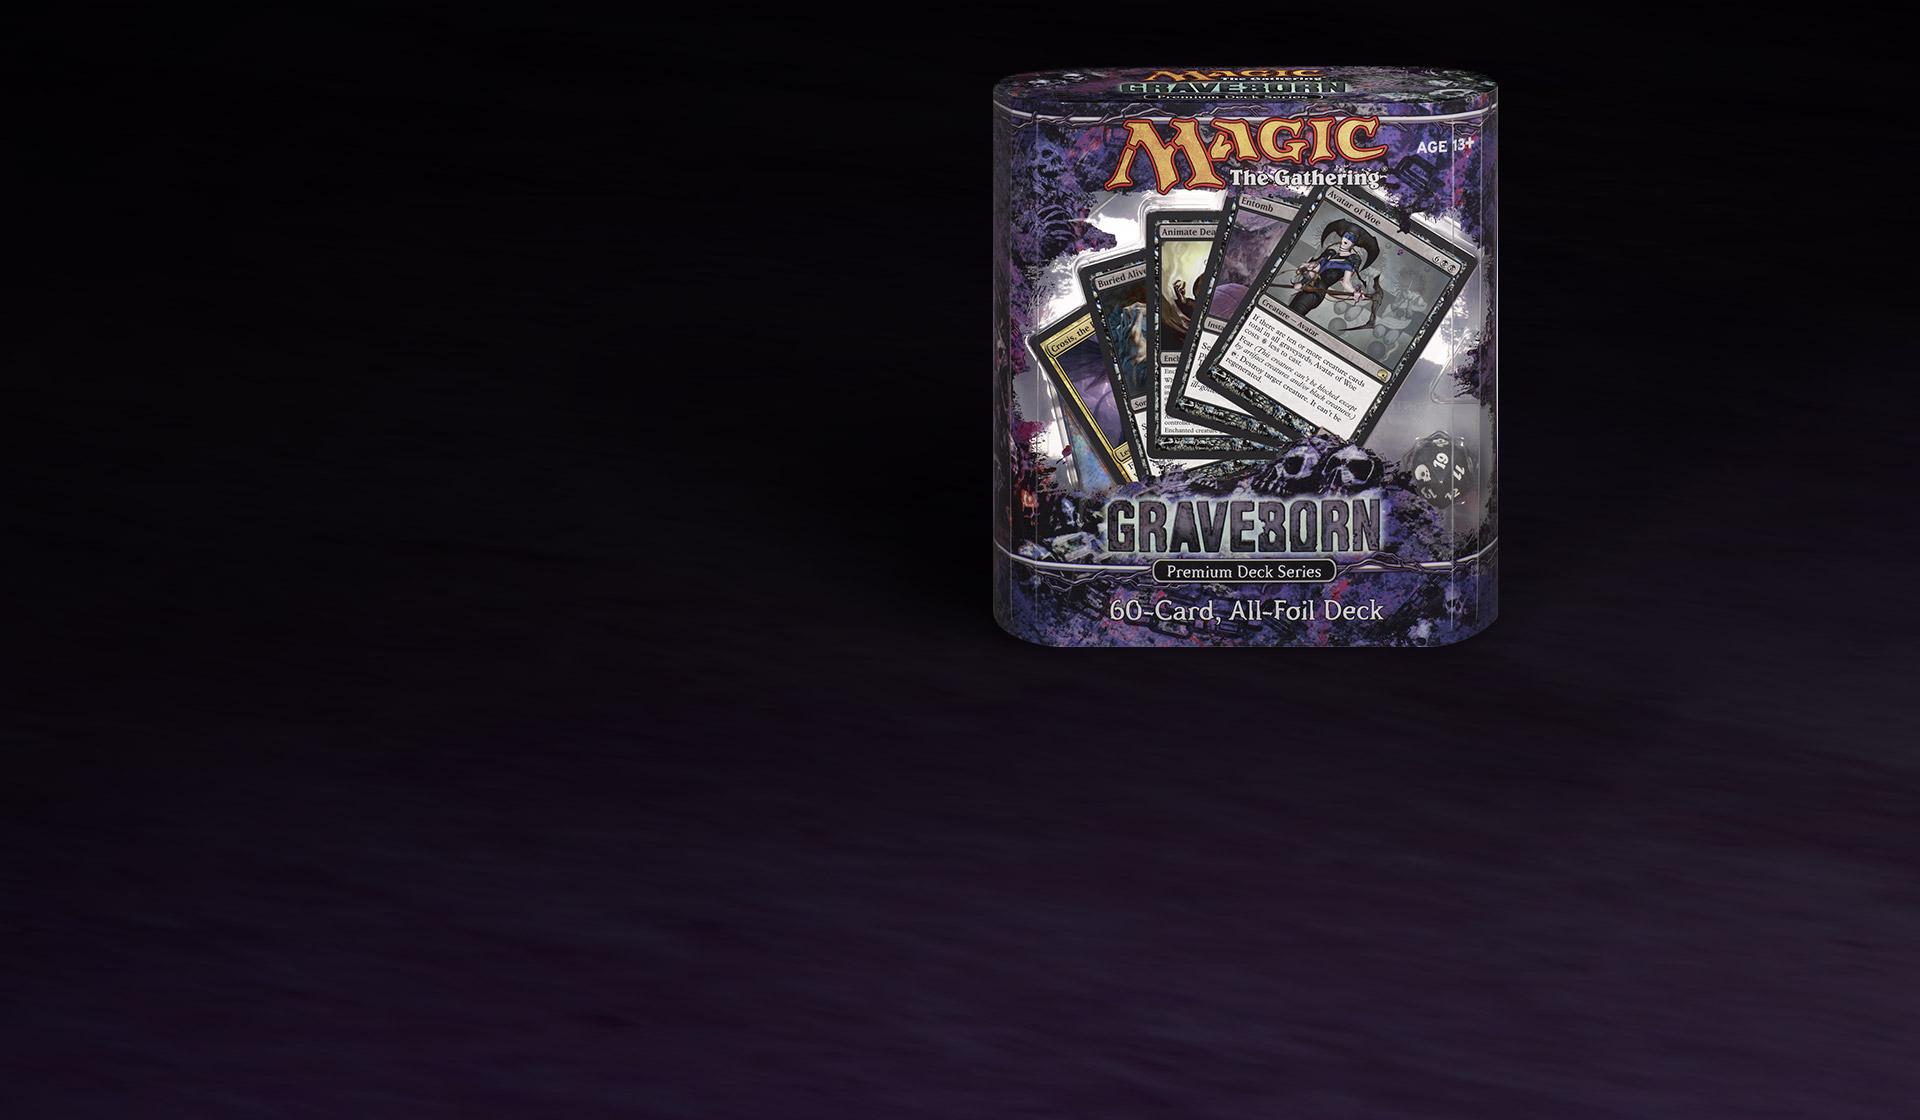 Sickening Dreams Sorcery FOIL Premium Deck Series:Graveborn #18//2011 LOT OF 2